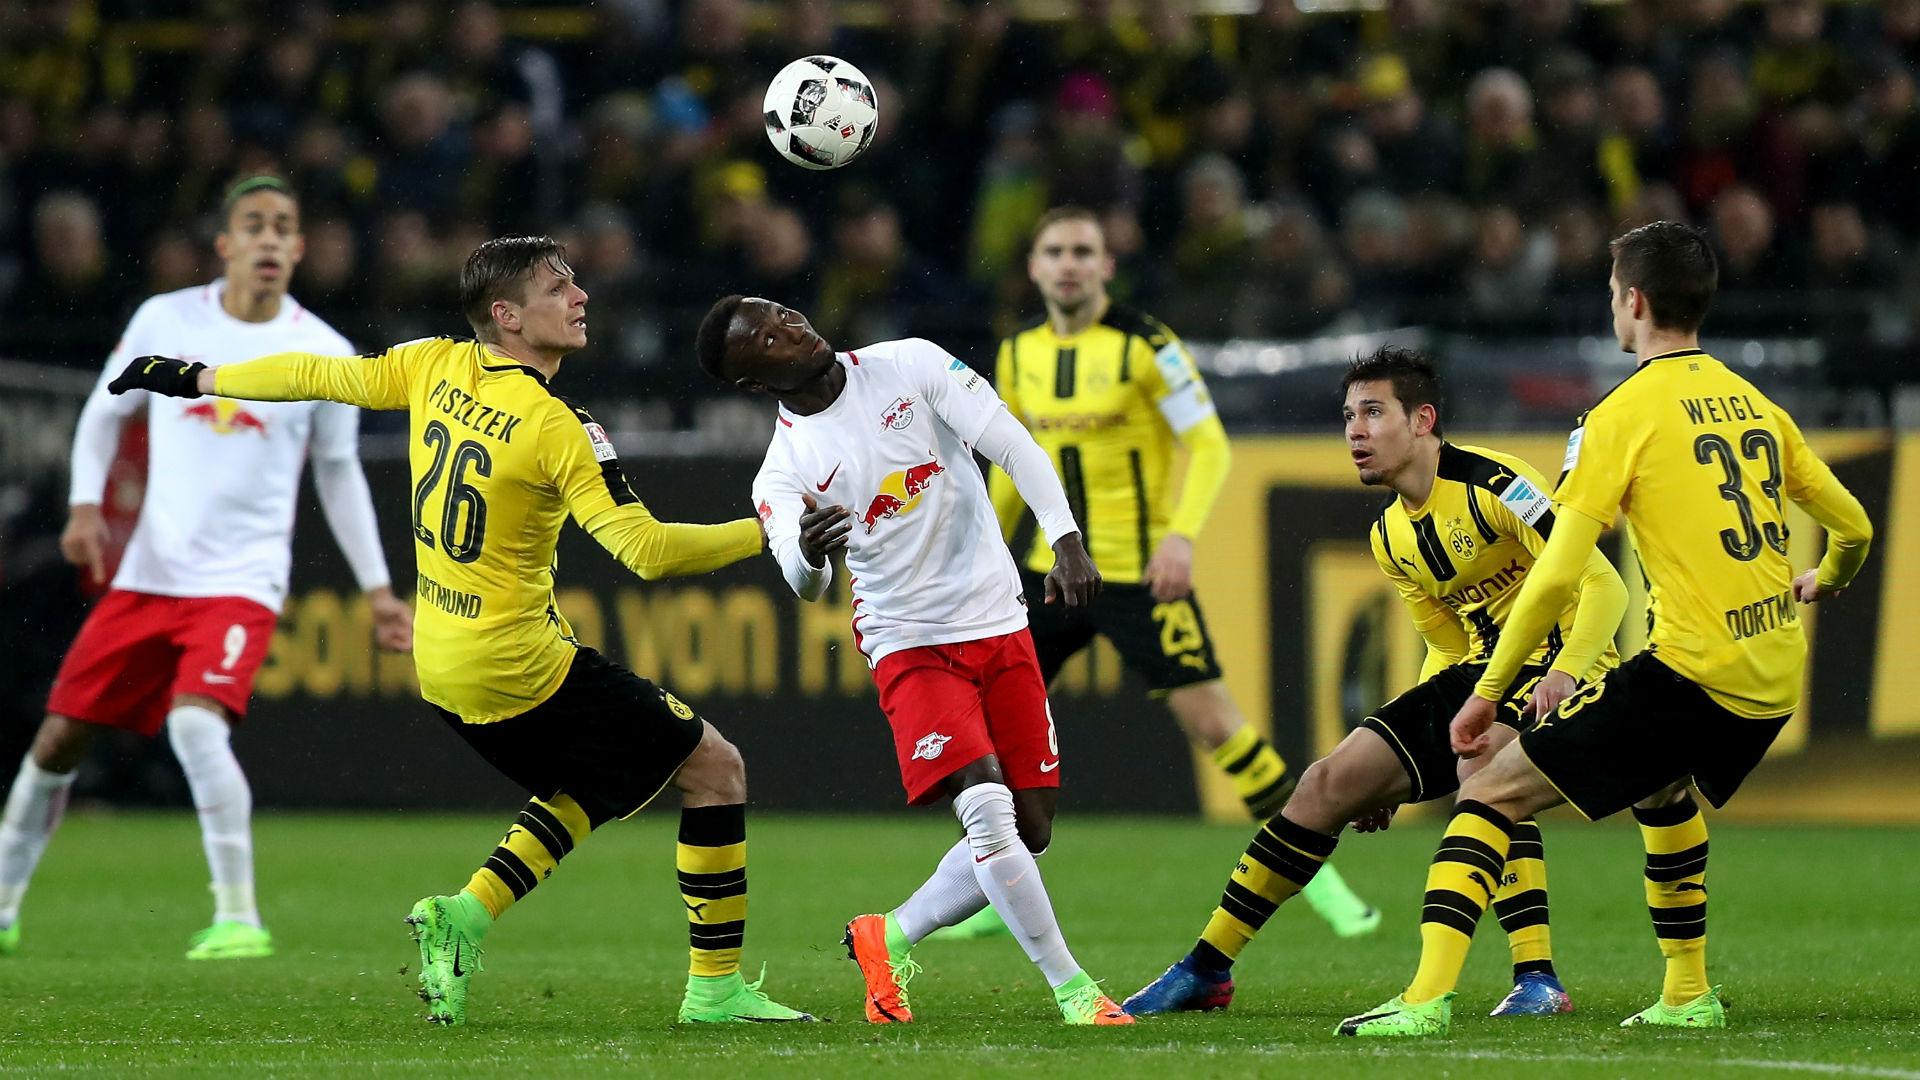 Borussia Dortmund vs RB Leipzig: prediction for 8.05.2021